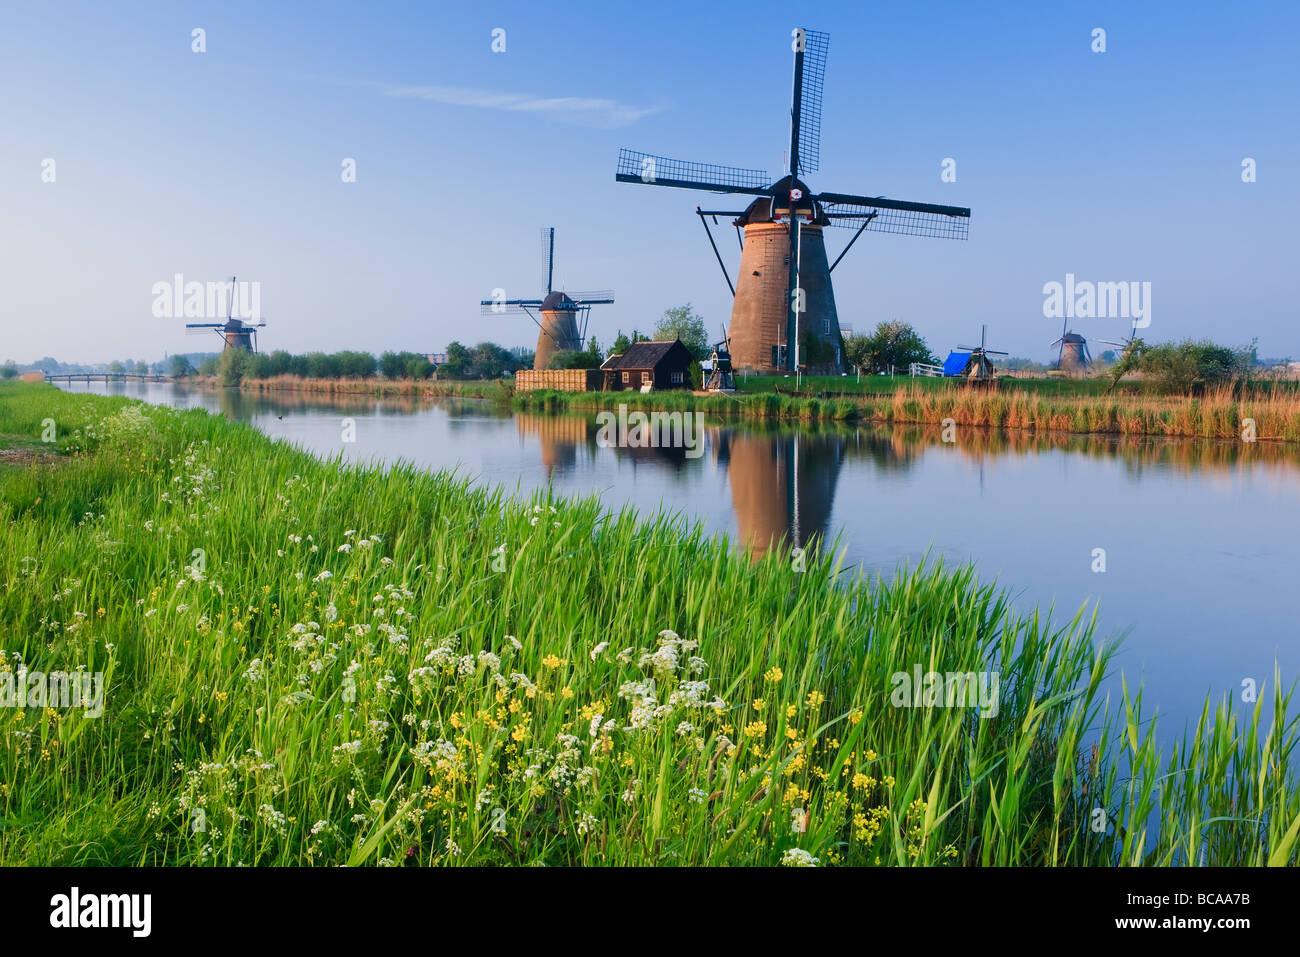 Windmills at the Kinderdijk, Netherlands - Stock Image